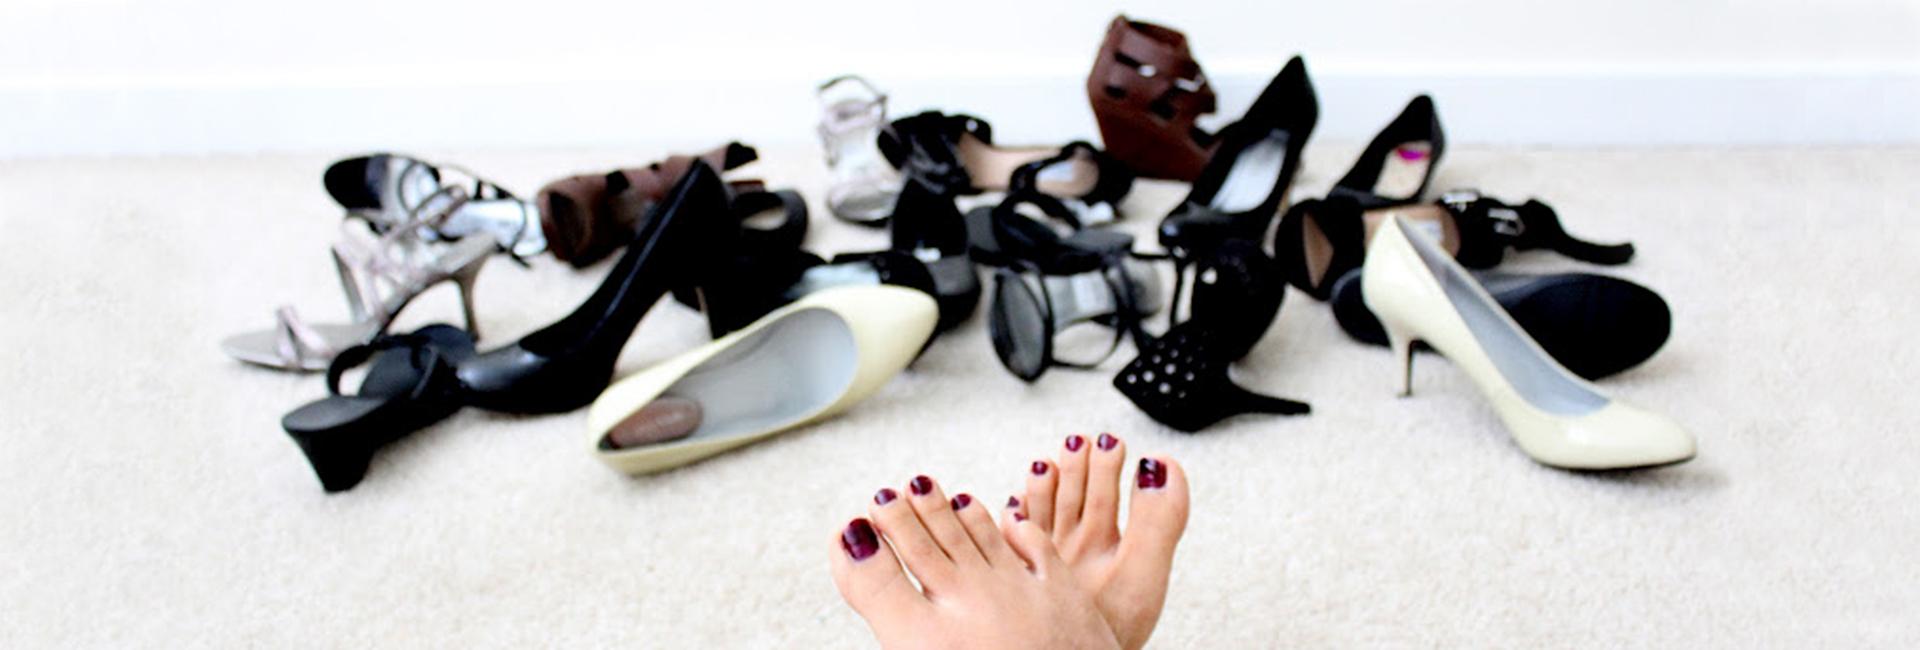 alfashiongroup-scarpe-online